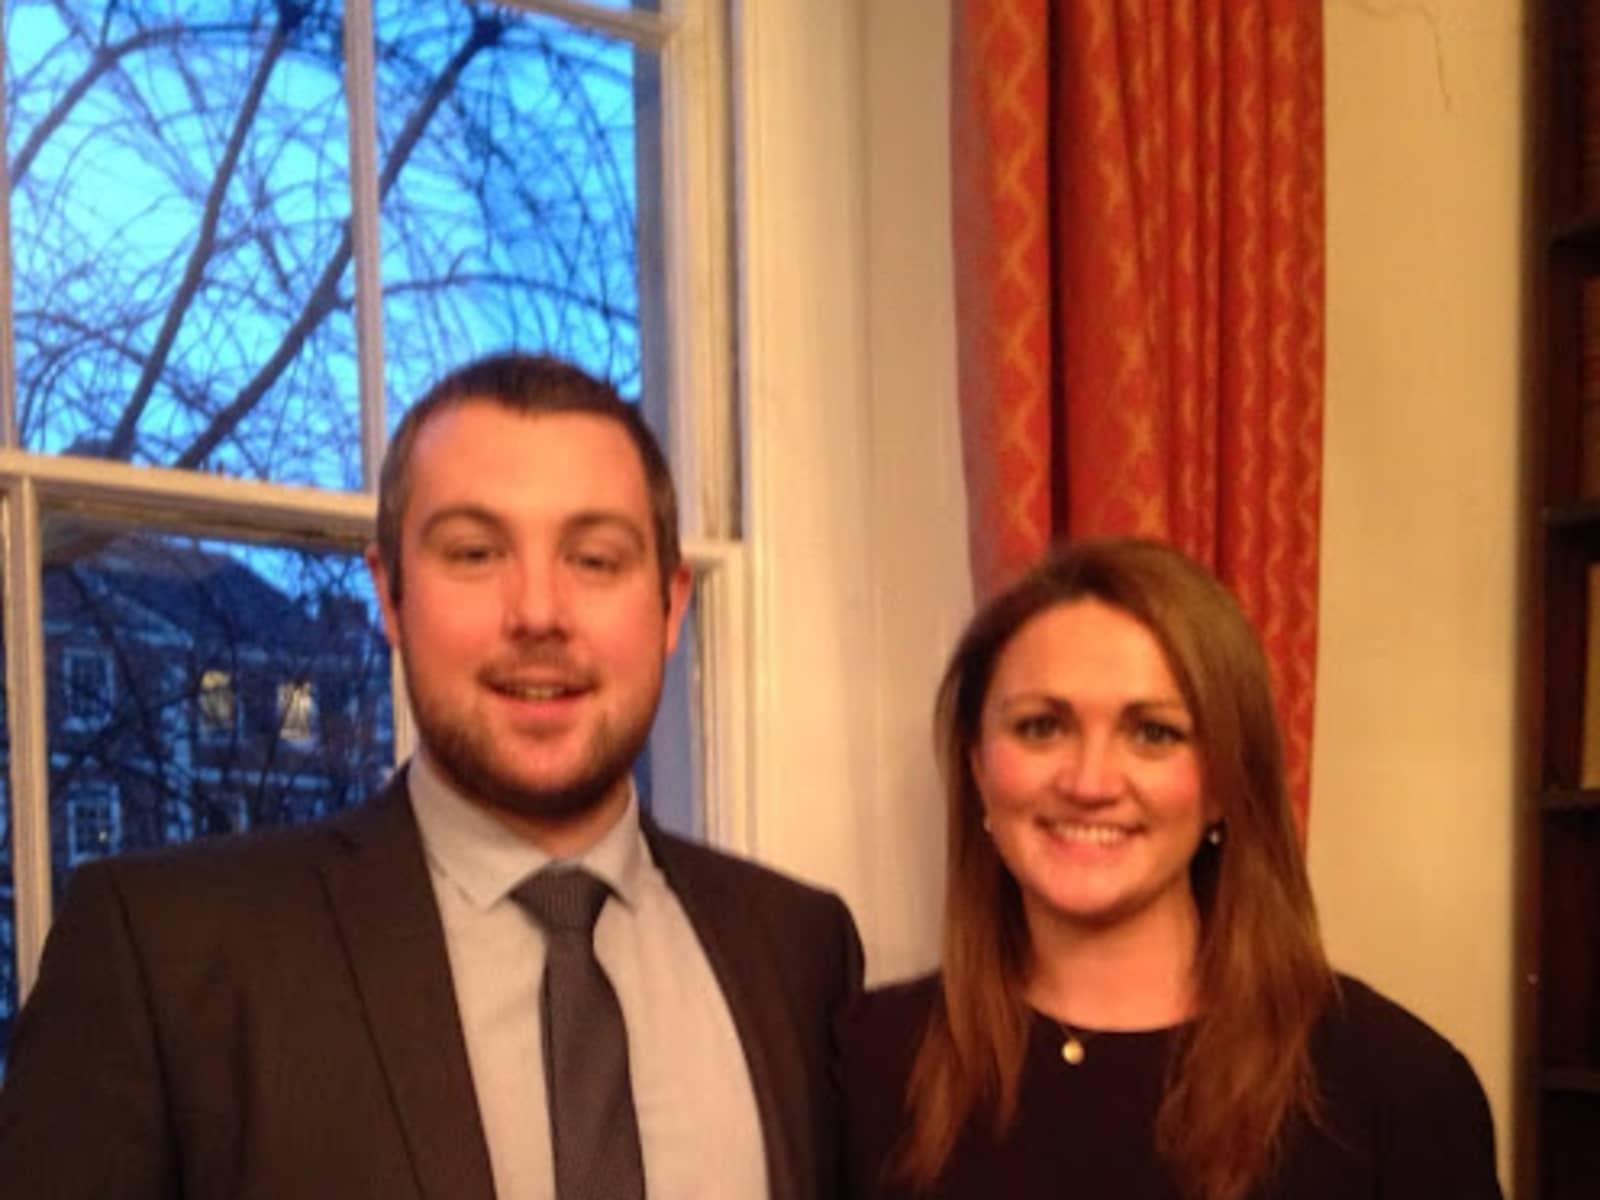 Brendan & Laura from London, United Kingdom